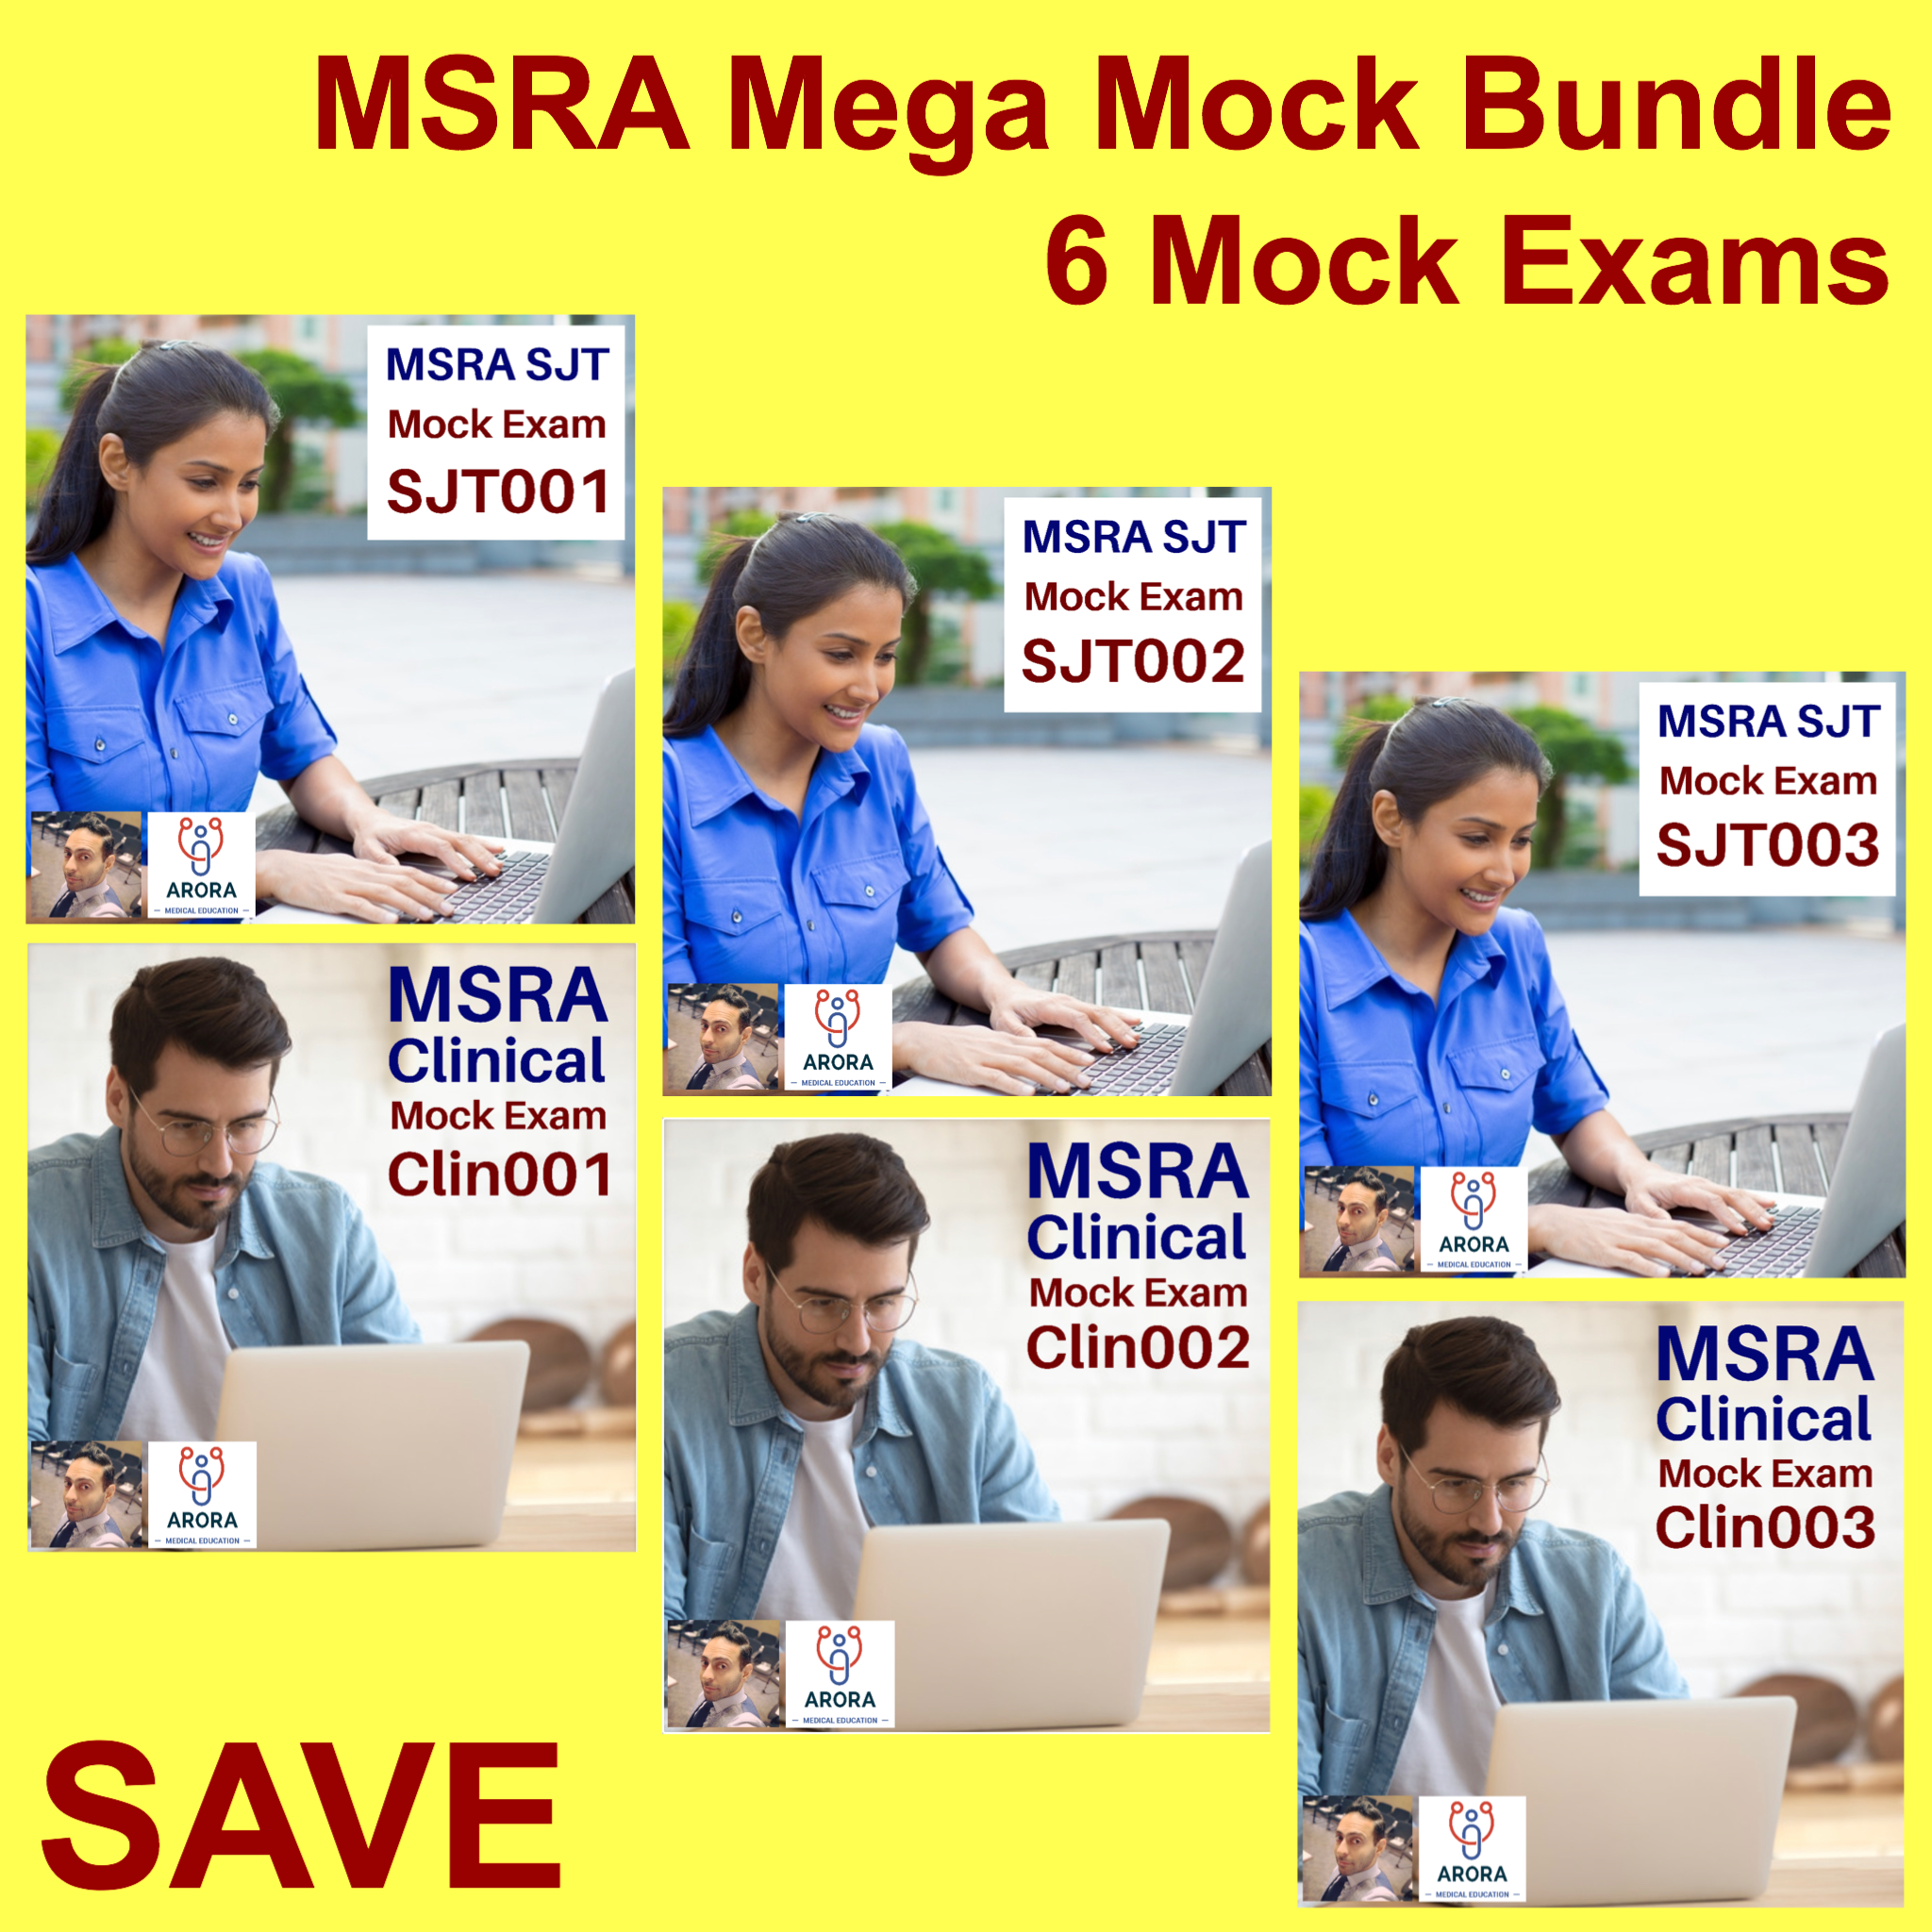 msra mega - MRCGP CSA, AKT and PLAB Exam Courses and Online Webinars - Arora Medical Education